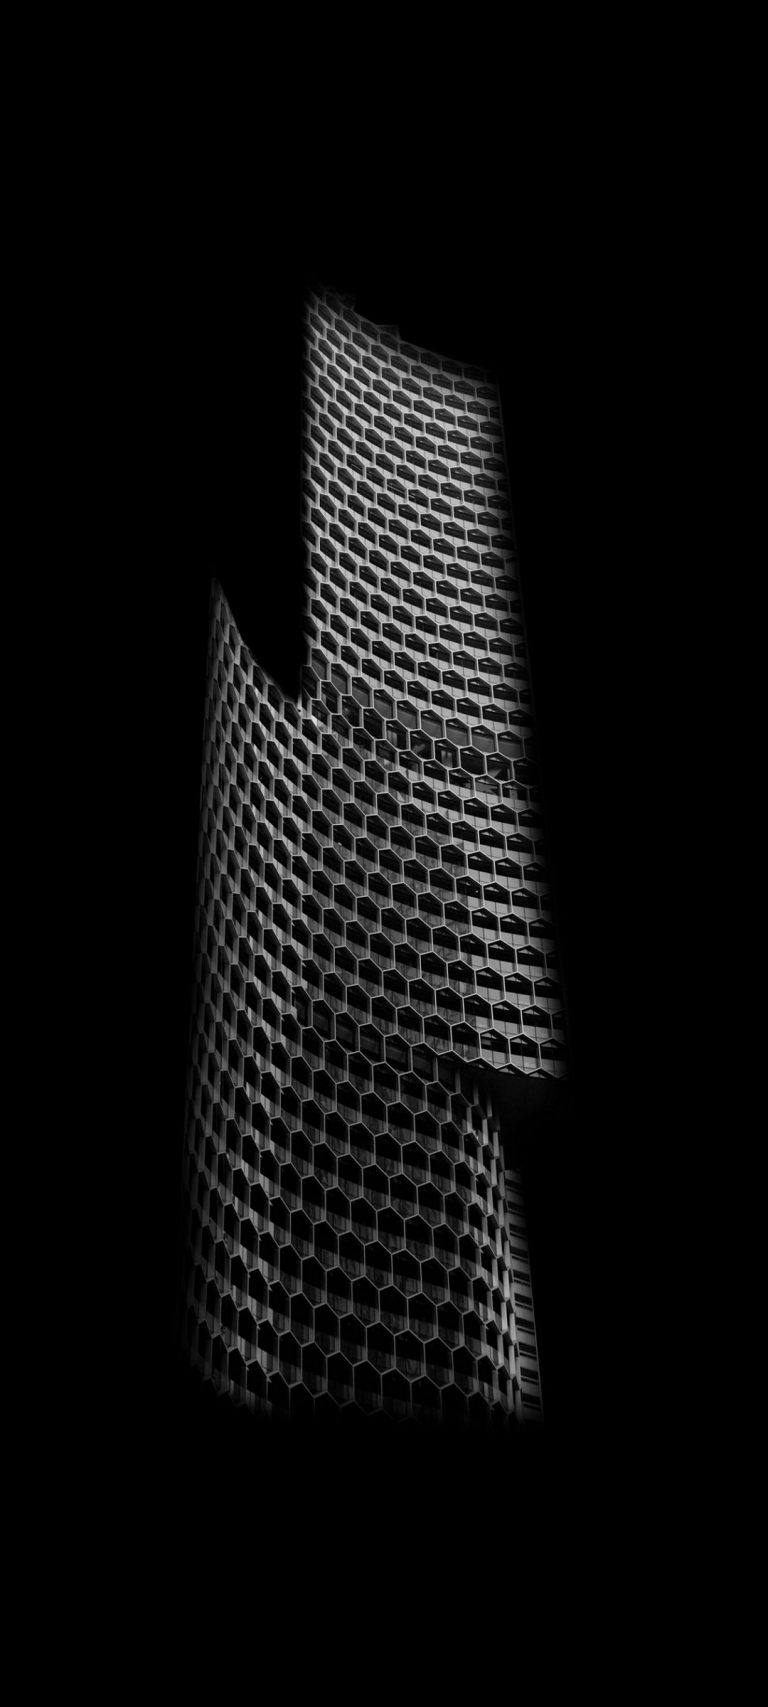 Building Shadow Minimalism 1080x2400 768x1707